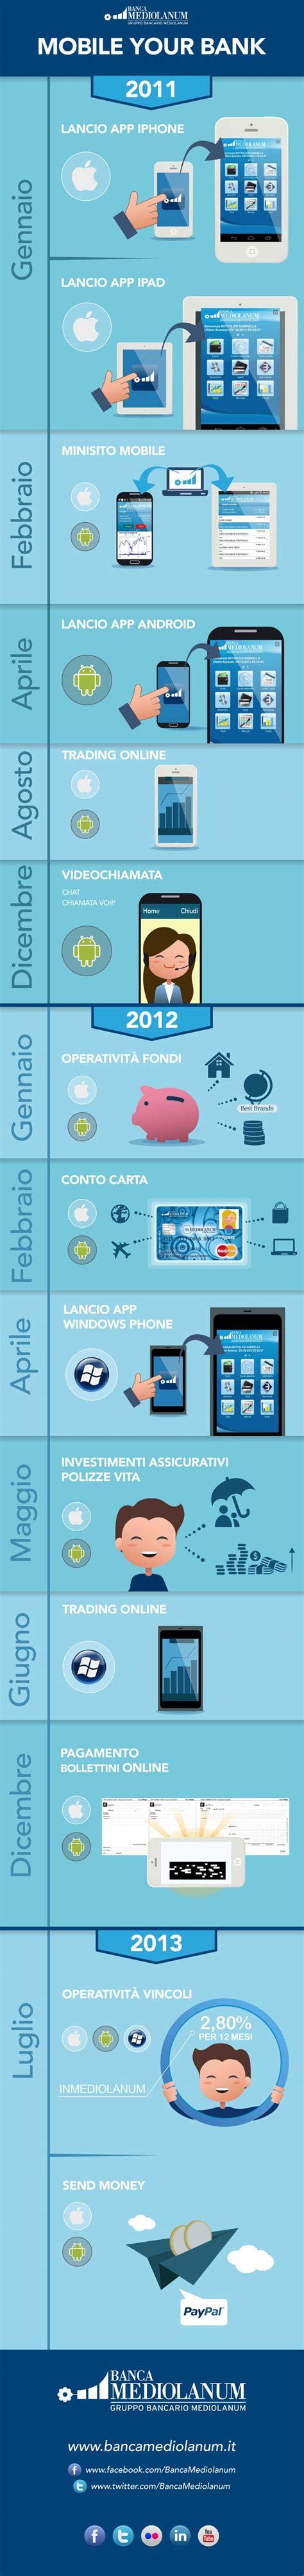 Paypal Banca by Banca Mediolanum E Paypal Insieme Per Send Money